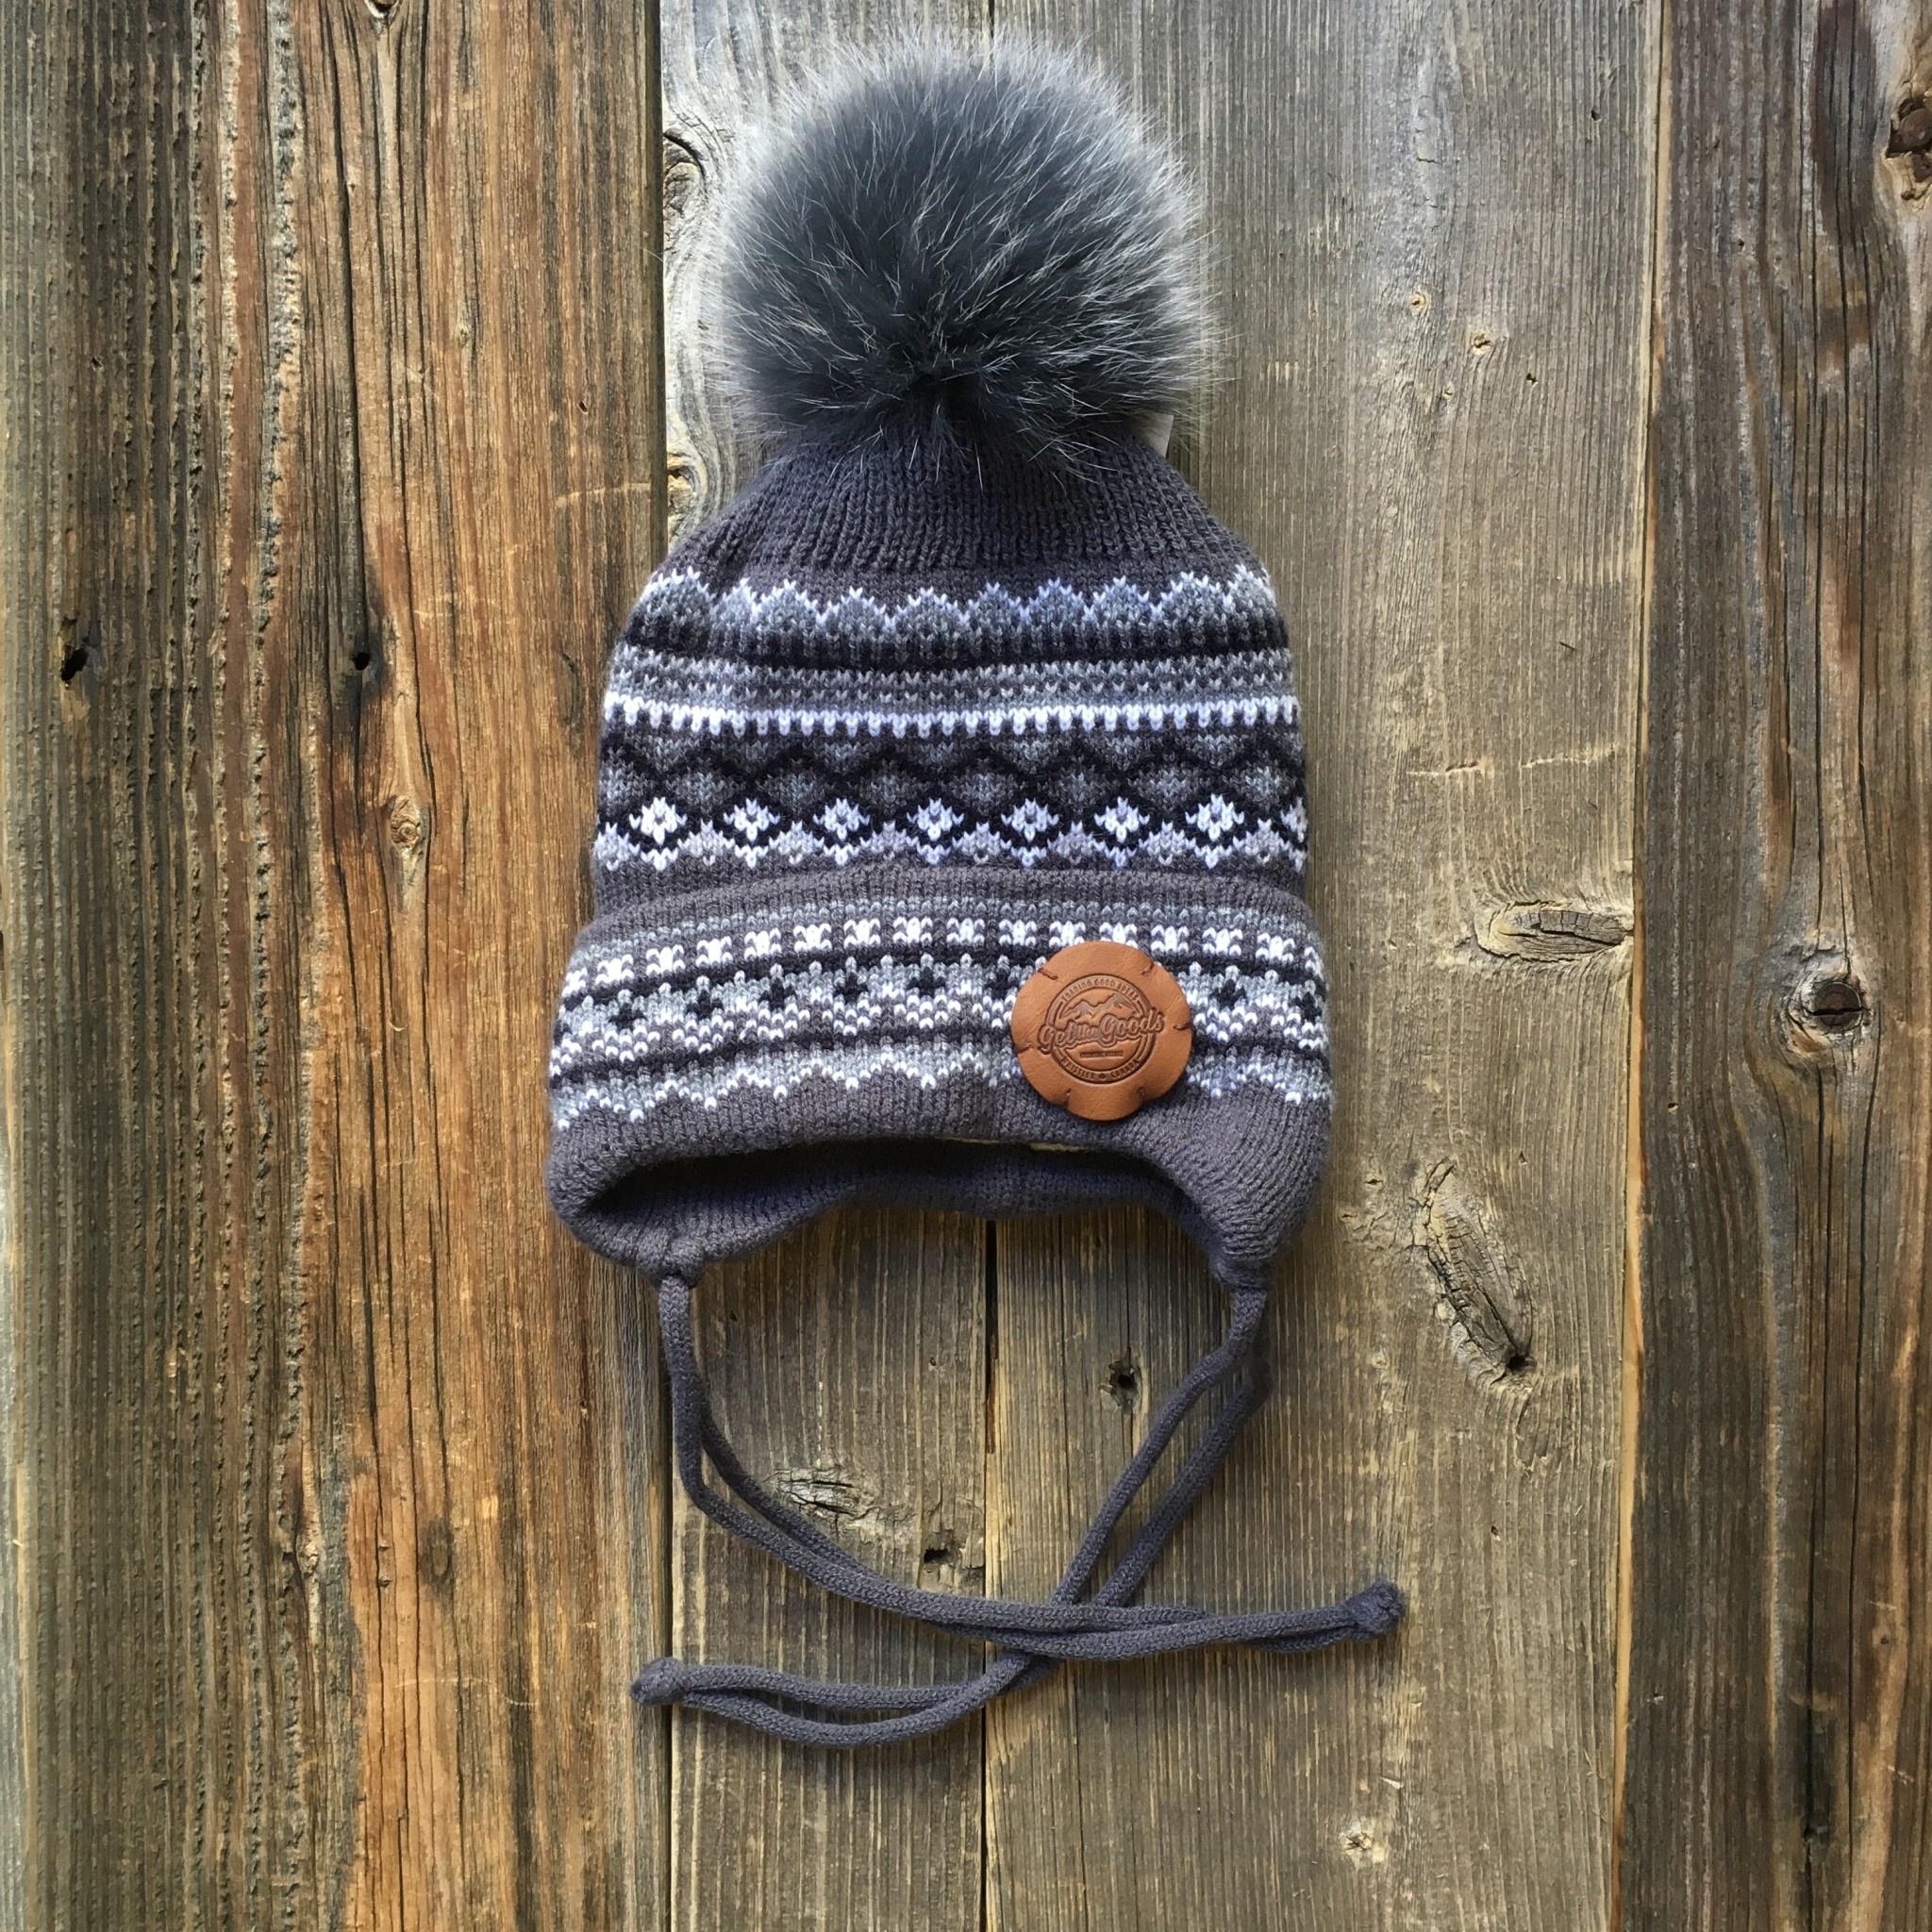 Get the Goods Kids Knit Hat with Fur Pom Alpine